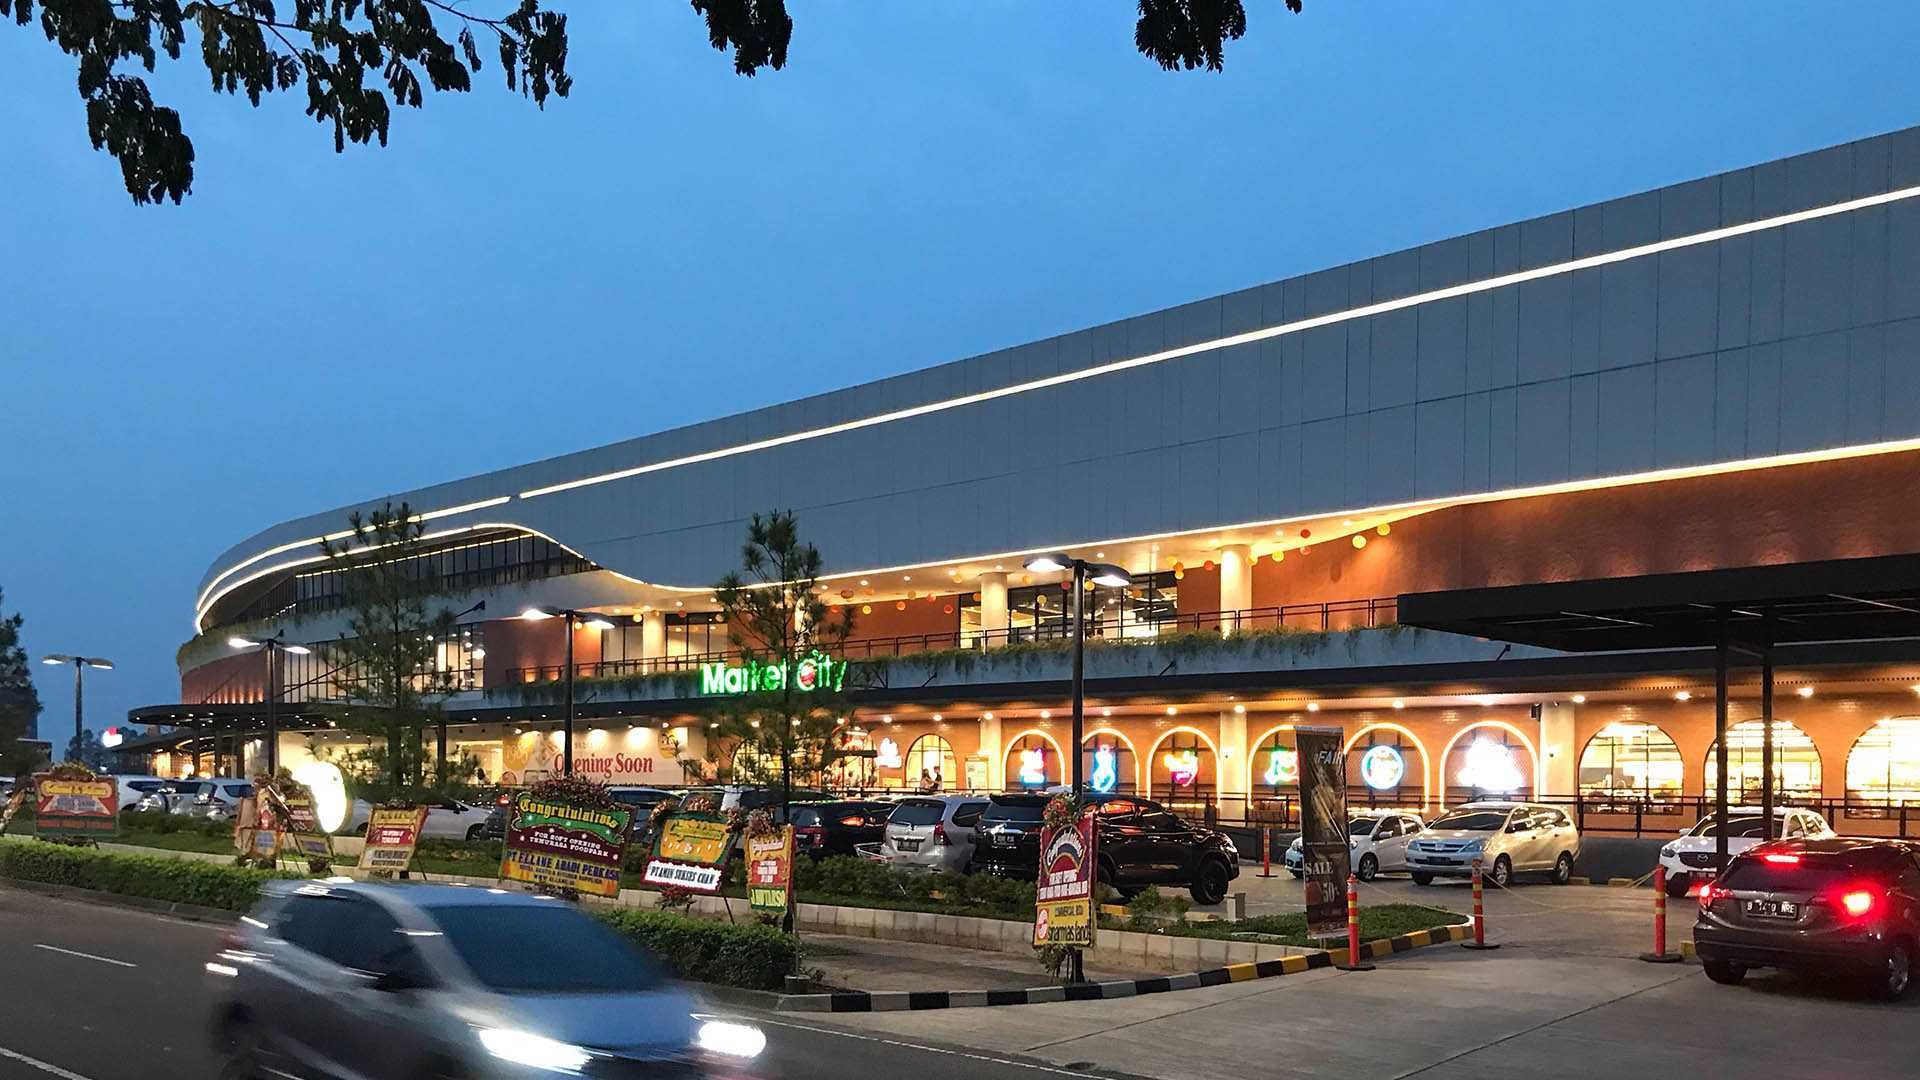 Co Associates Ararasa Mall Sinar Mas Land Plaza Jl. Grand Boulevard Bsd City, Sampora, Kec. Cisauk, Tangerang, Banten 15345, Indonesia Sinar Mas Land Plaza Jl. Grand Boulevard Bsd City, Sampora, Kec. Cisauk, Tangerang, Banten 15345, Indonesia Co-Associates-Ararasa-Mall  97071